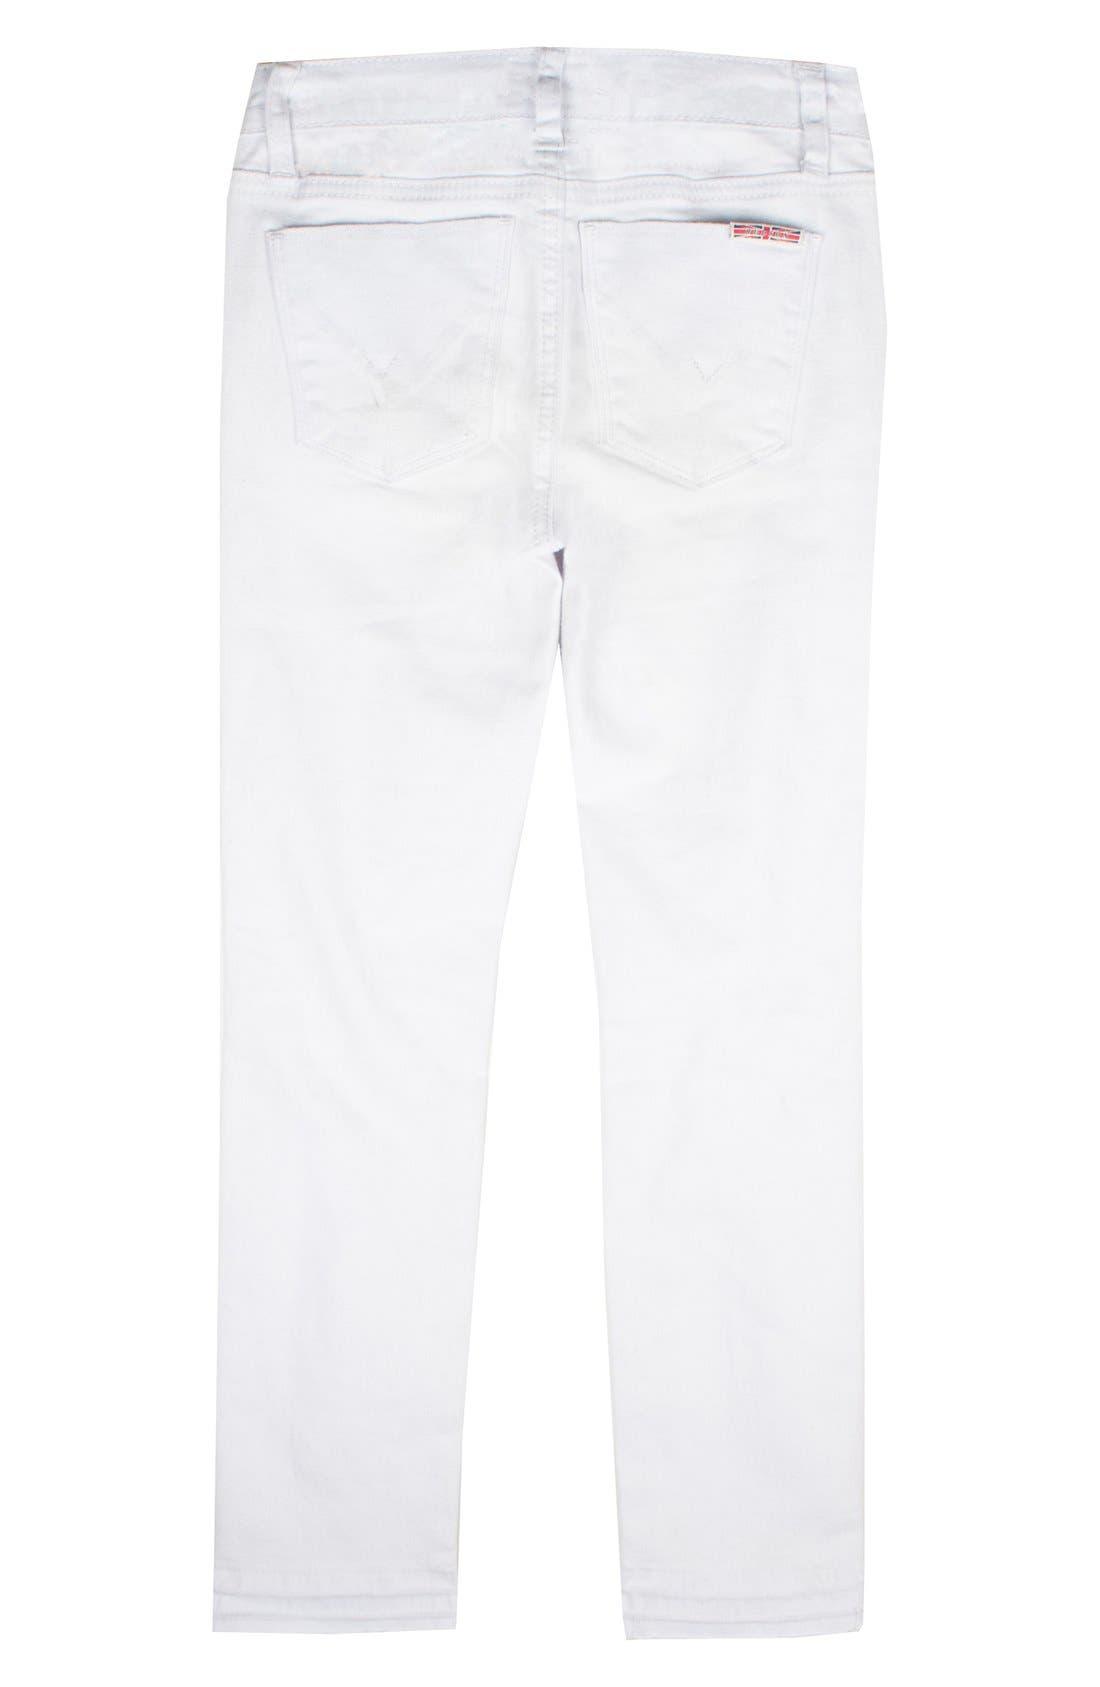 Seaside Crop Skinny Jeans,                             Alternate thumbnail 4, color,                             100